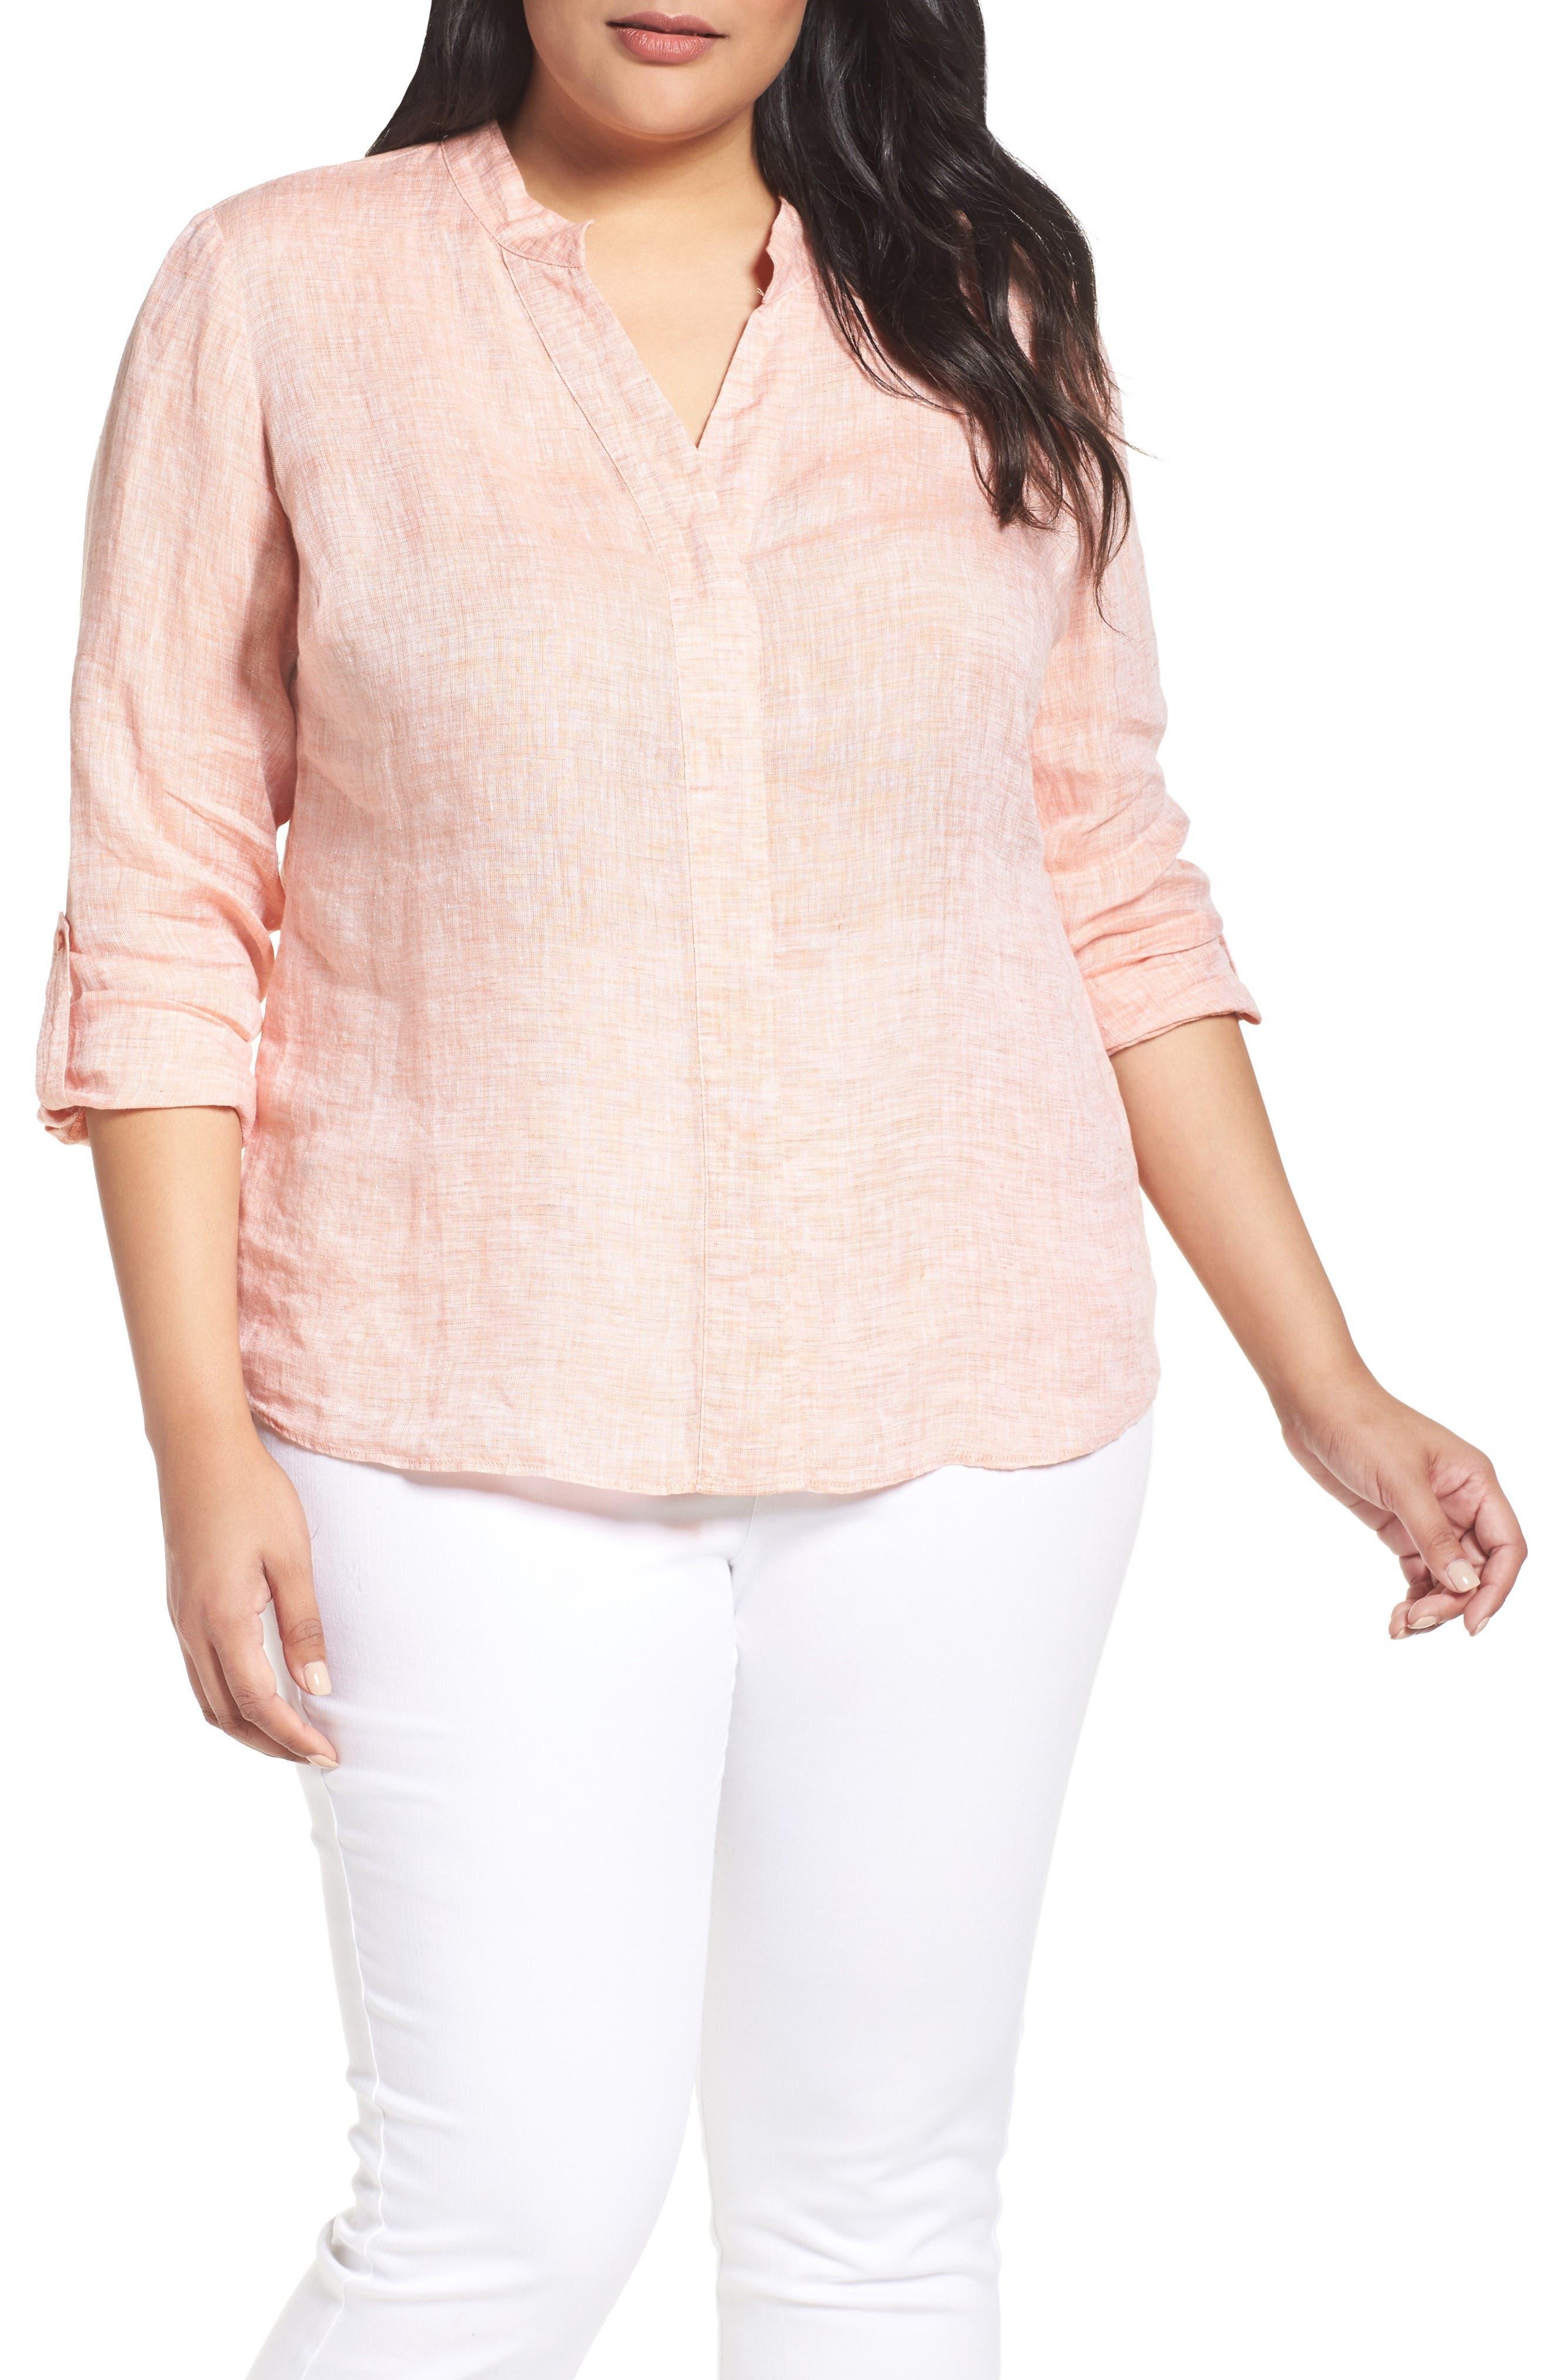 NIC+ZOE, Drifty Woven Linen Shirt, Main thumbnail 1, color, TANGERINE